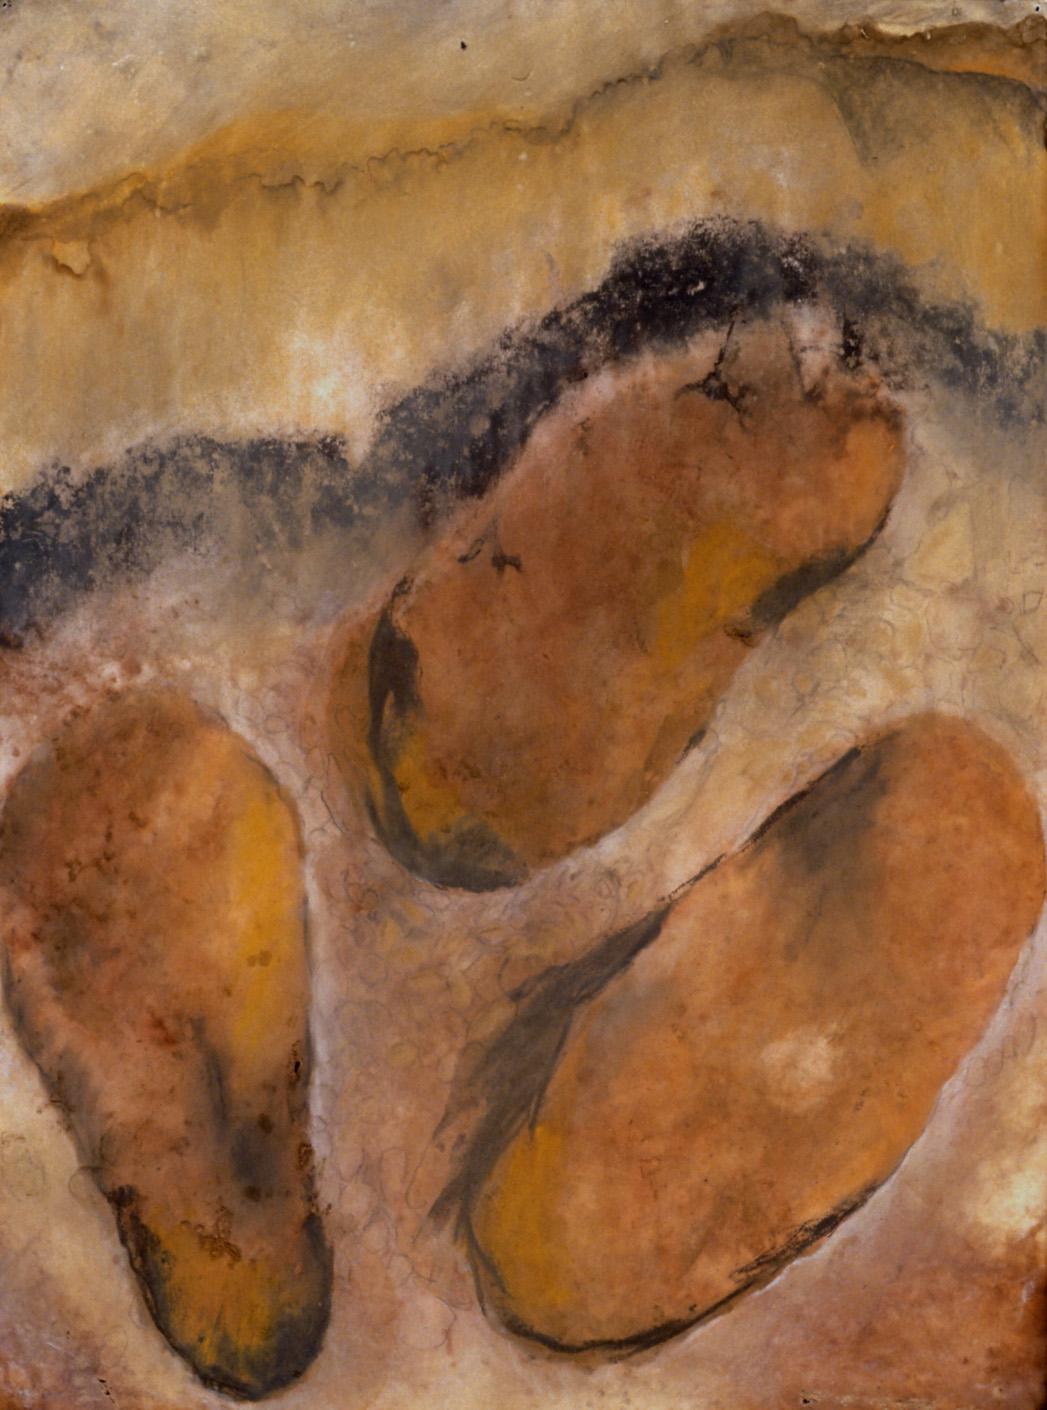 "Basalt Pillows On   Cavair  from John McPhee's  Assembling California , 2000  Stain & mixed media on paper, 20 x 32""."